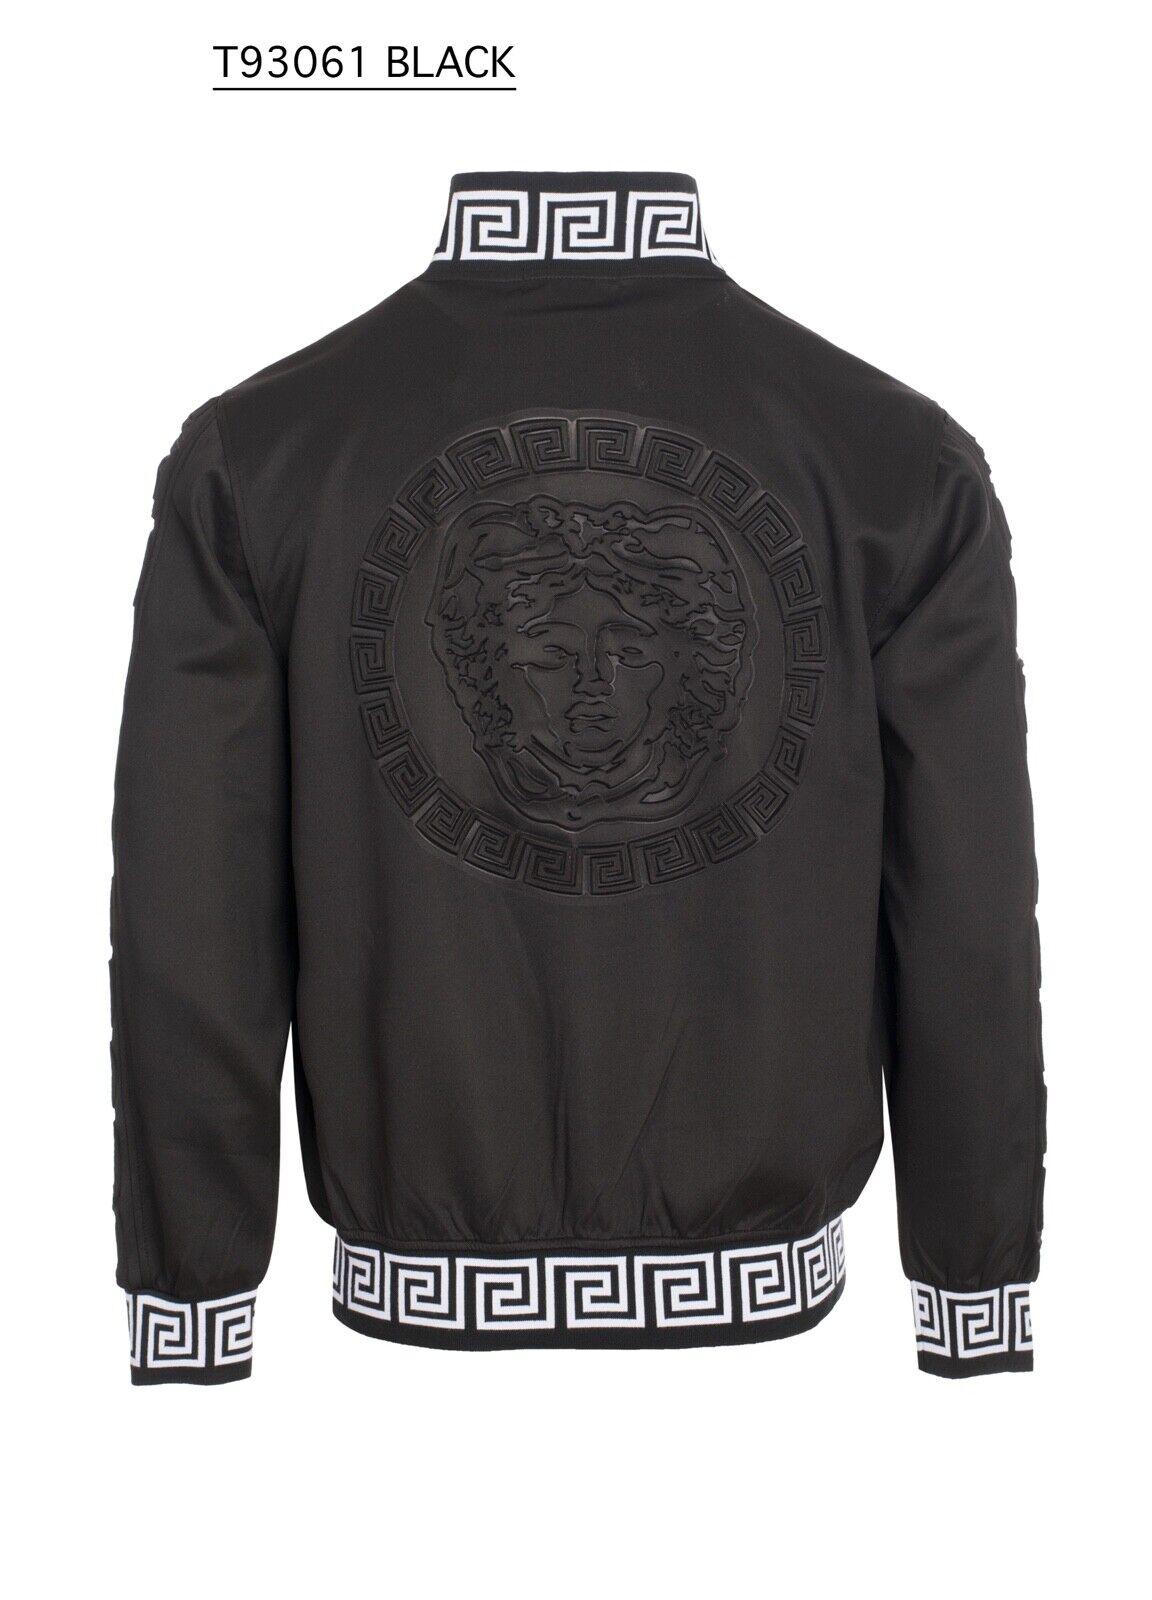 New Mens Black Zip Up Jacket Medusa on Back with White Greek Pattern Collar